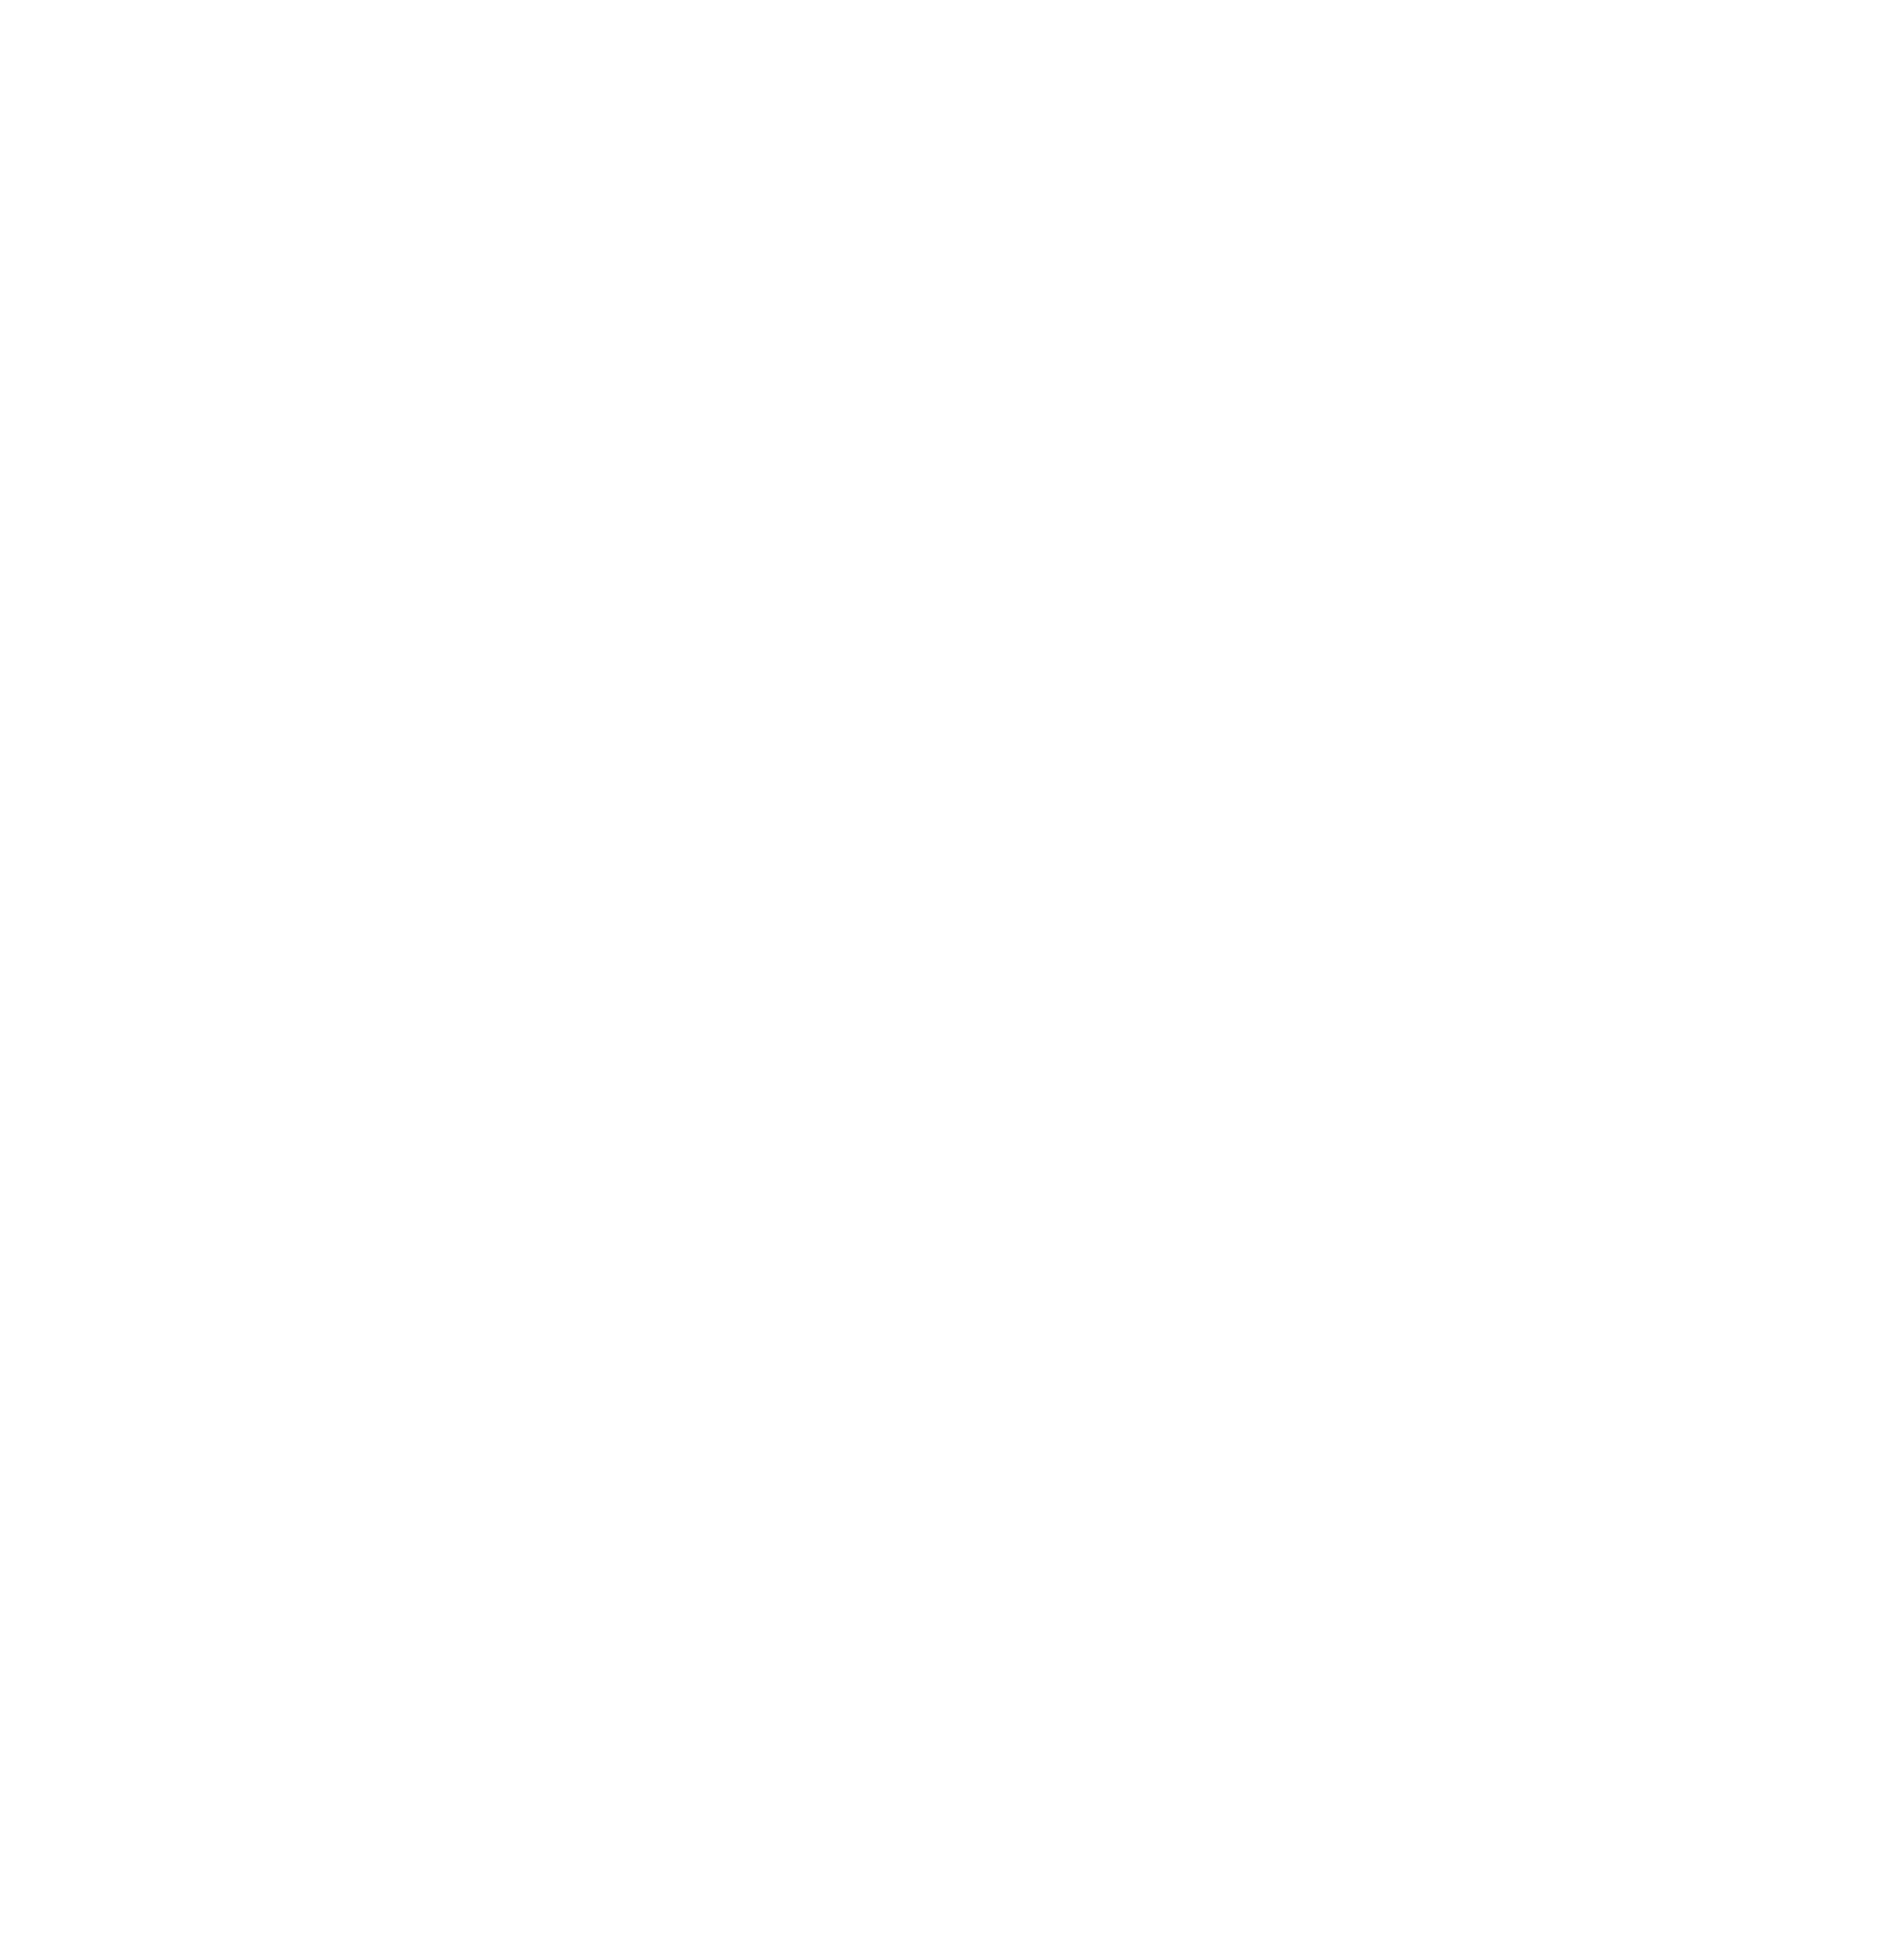 The Joel Cornette Foundation